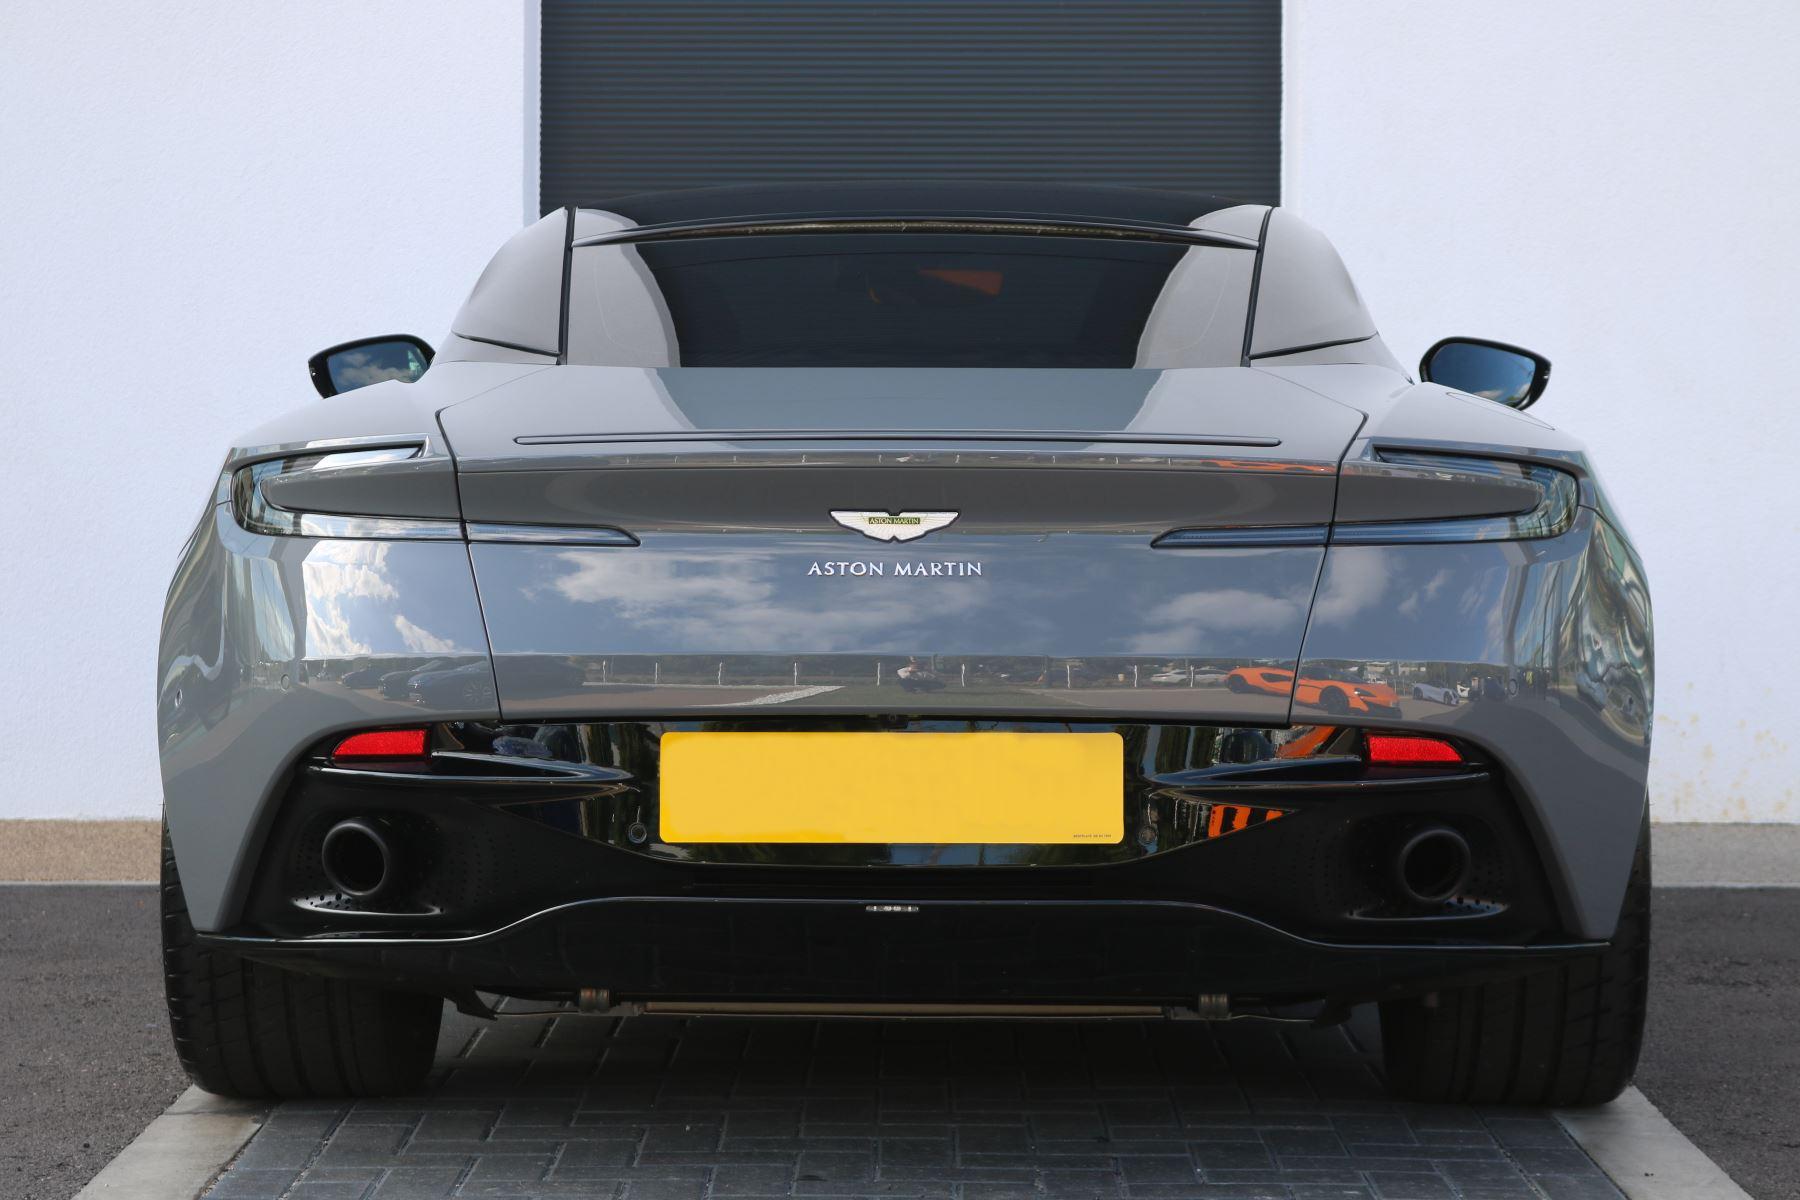 Aston Martin DB11 V12 AMR 2dr Touchtronic image 3